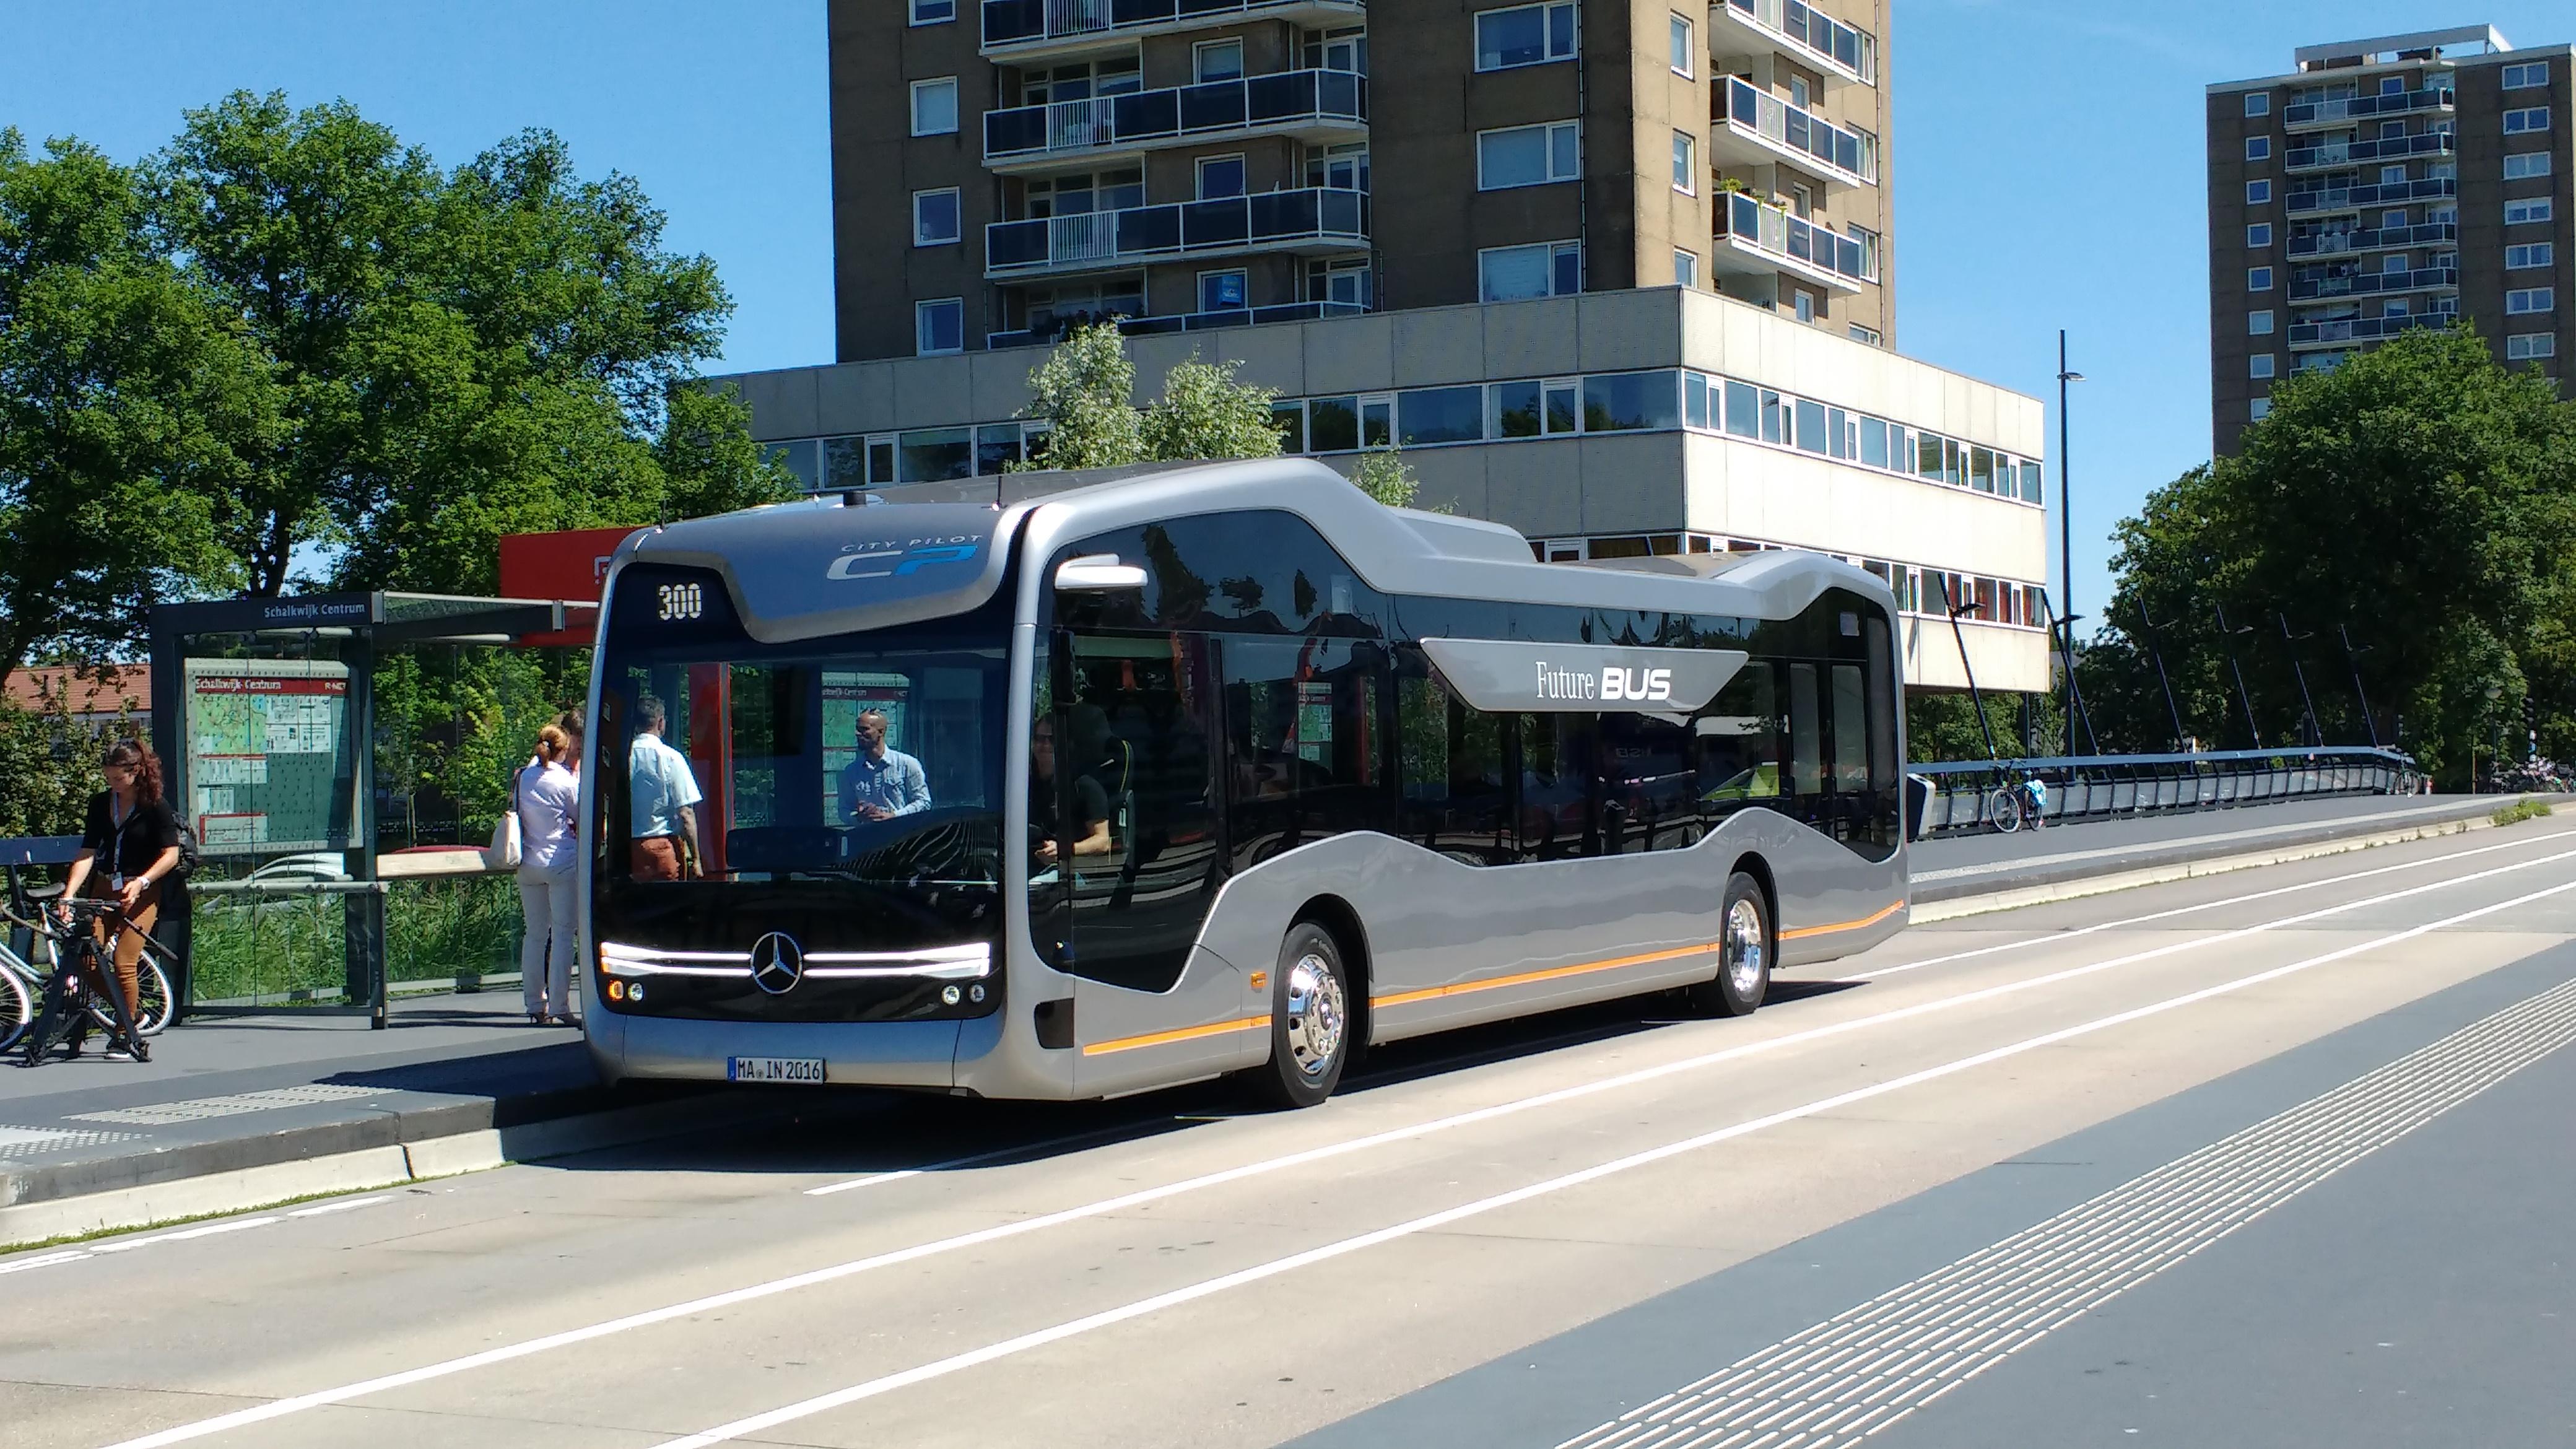 Daimler buses laat zelfrijdende stadsbus over openbare weg for Mercedes benz transit